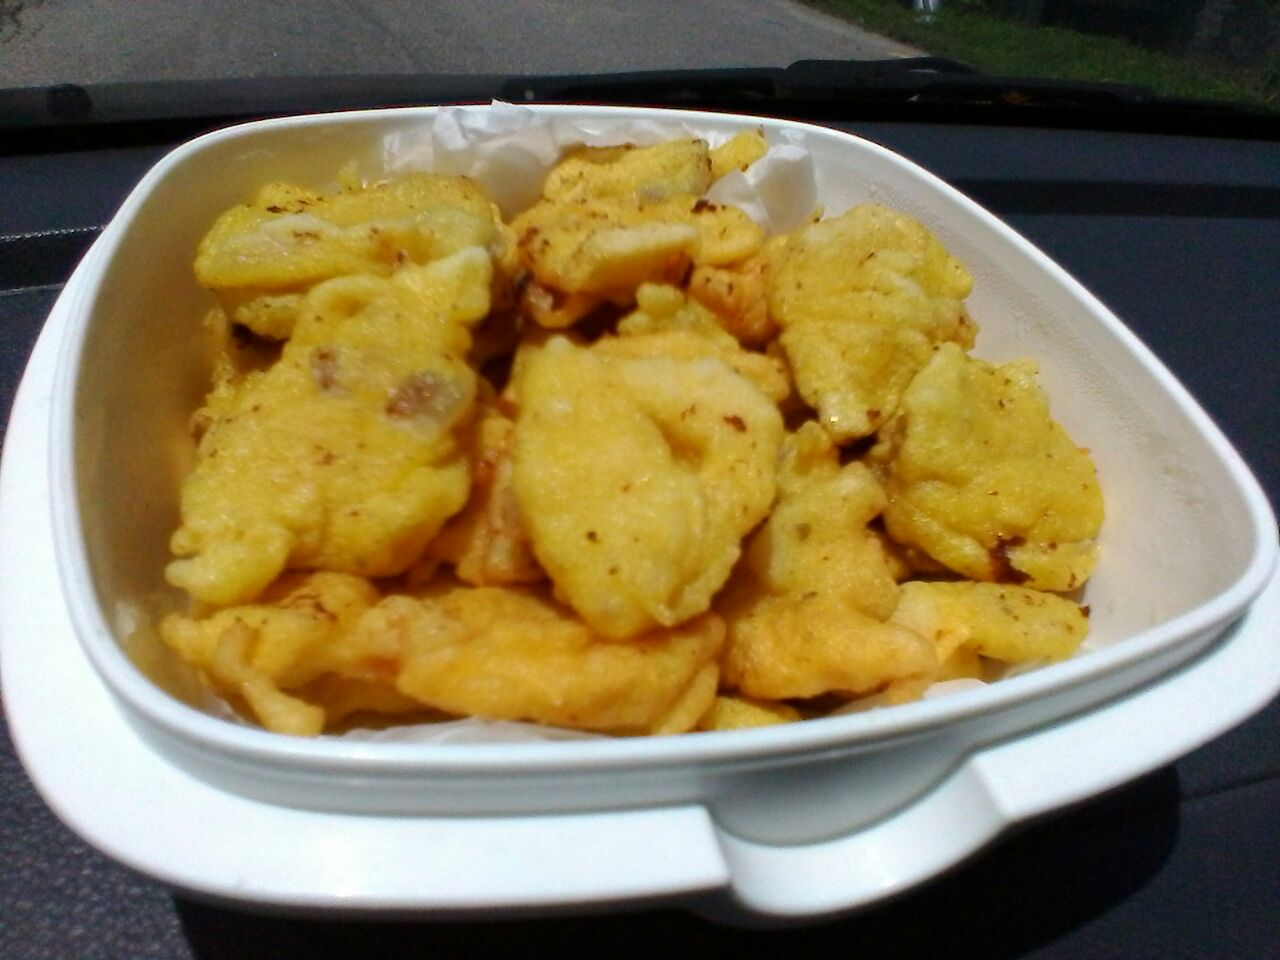 resepi cekodok seafood, cucur mudah dan simple, minum petang